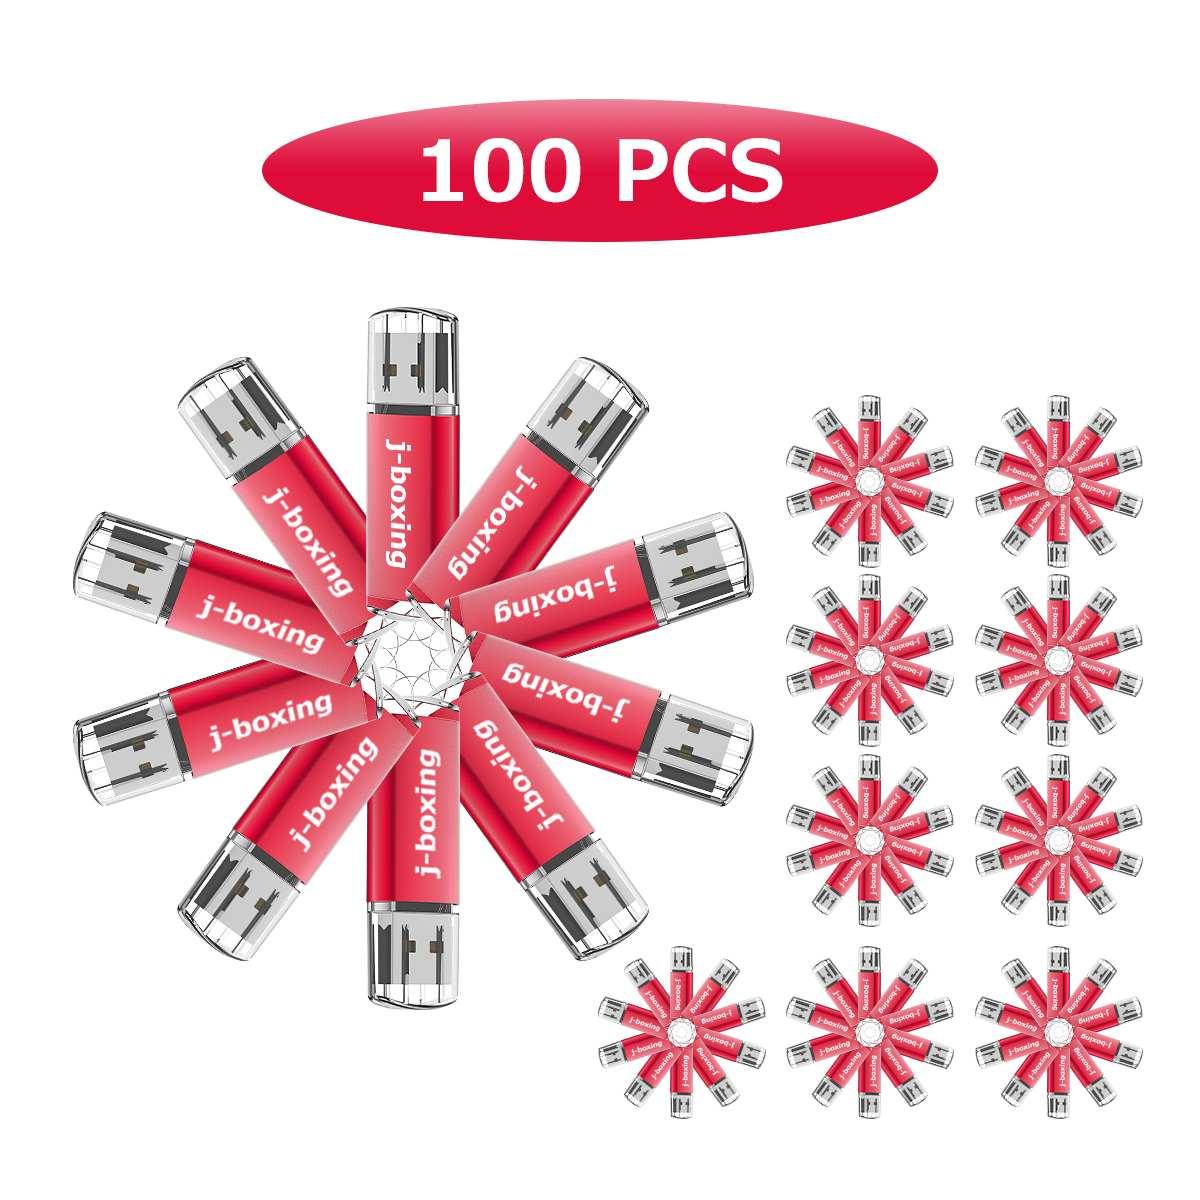 J-boxing 100X 1GB USB Flash Drive Printed Custom logo Rectangle Engraved Personalize Name Thumb Pen Drive 2GB 4GB 8GB 16GB 32GB enlarge